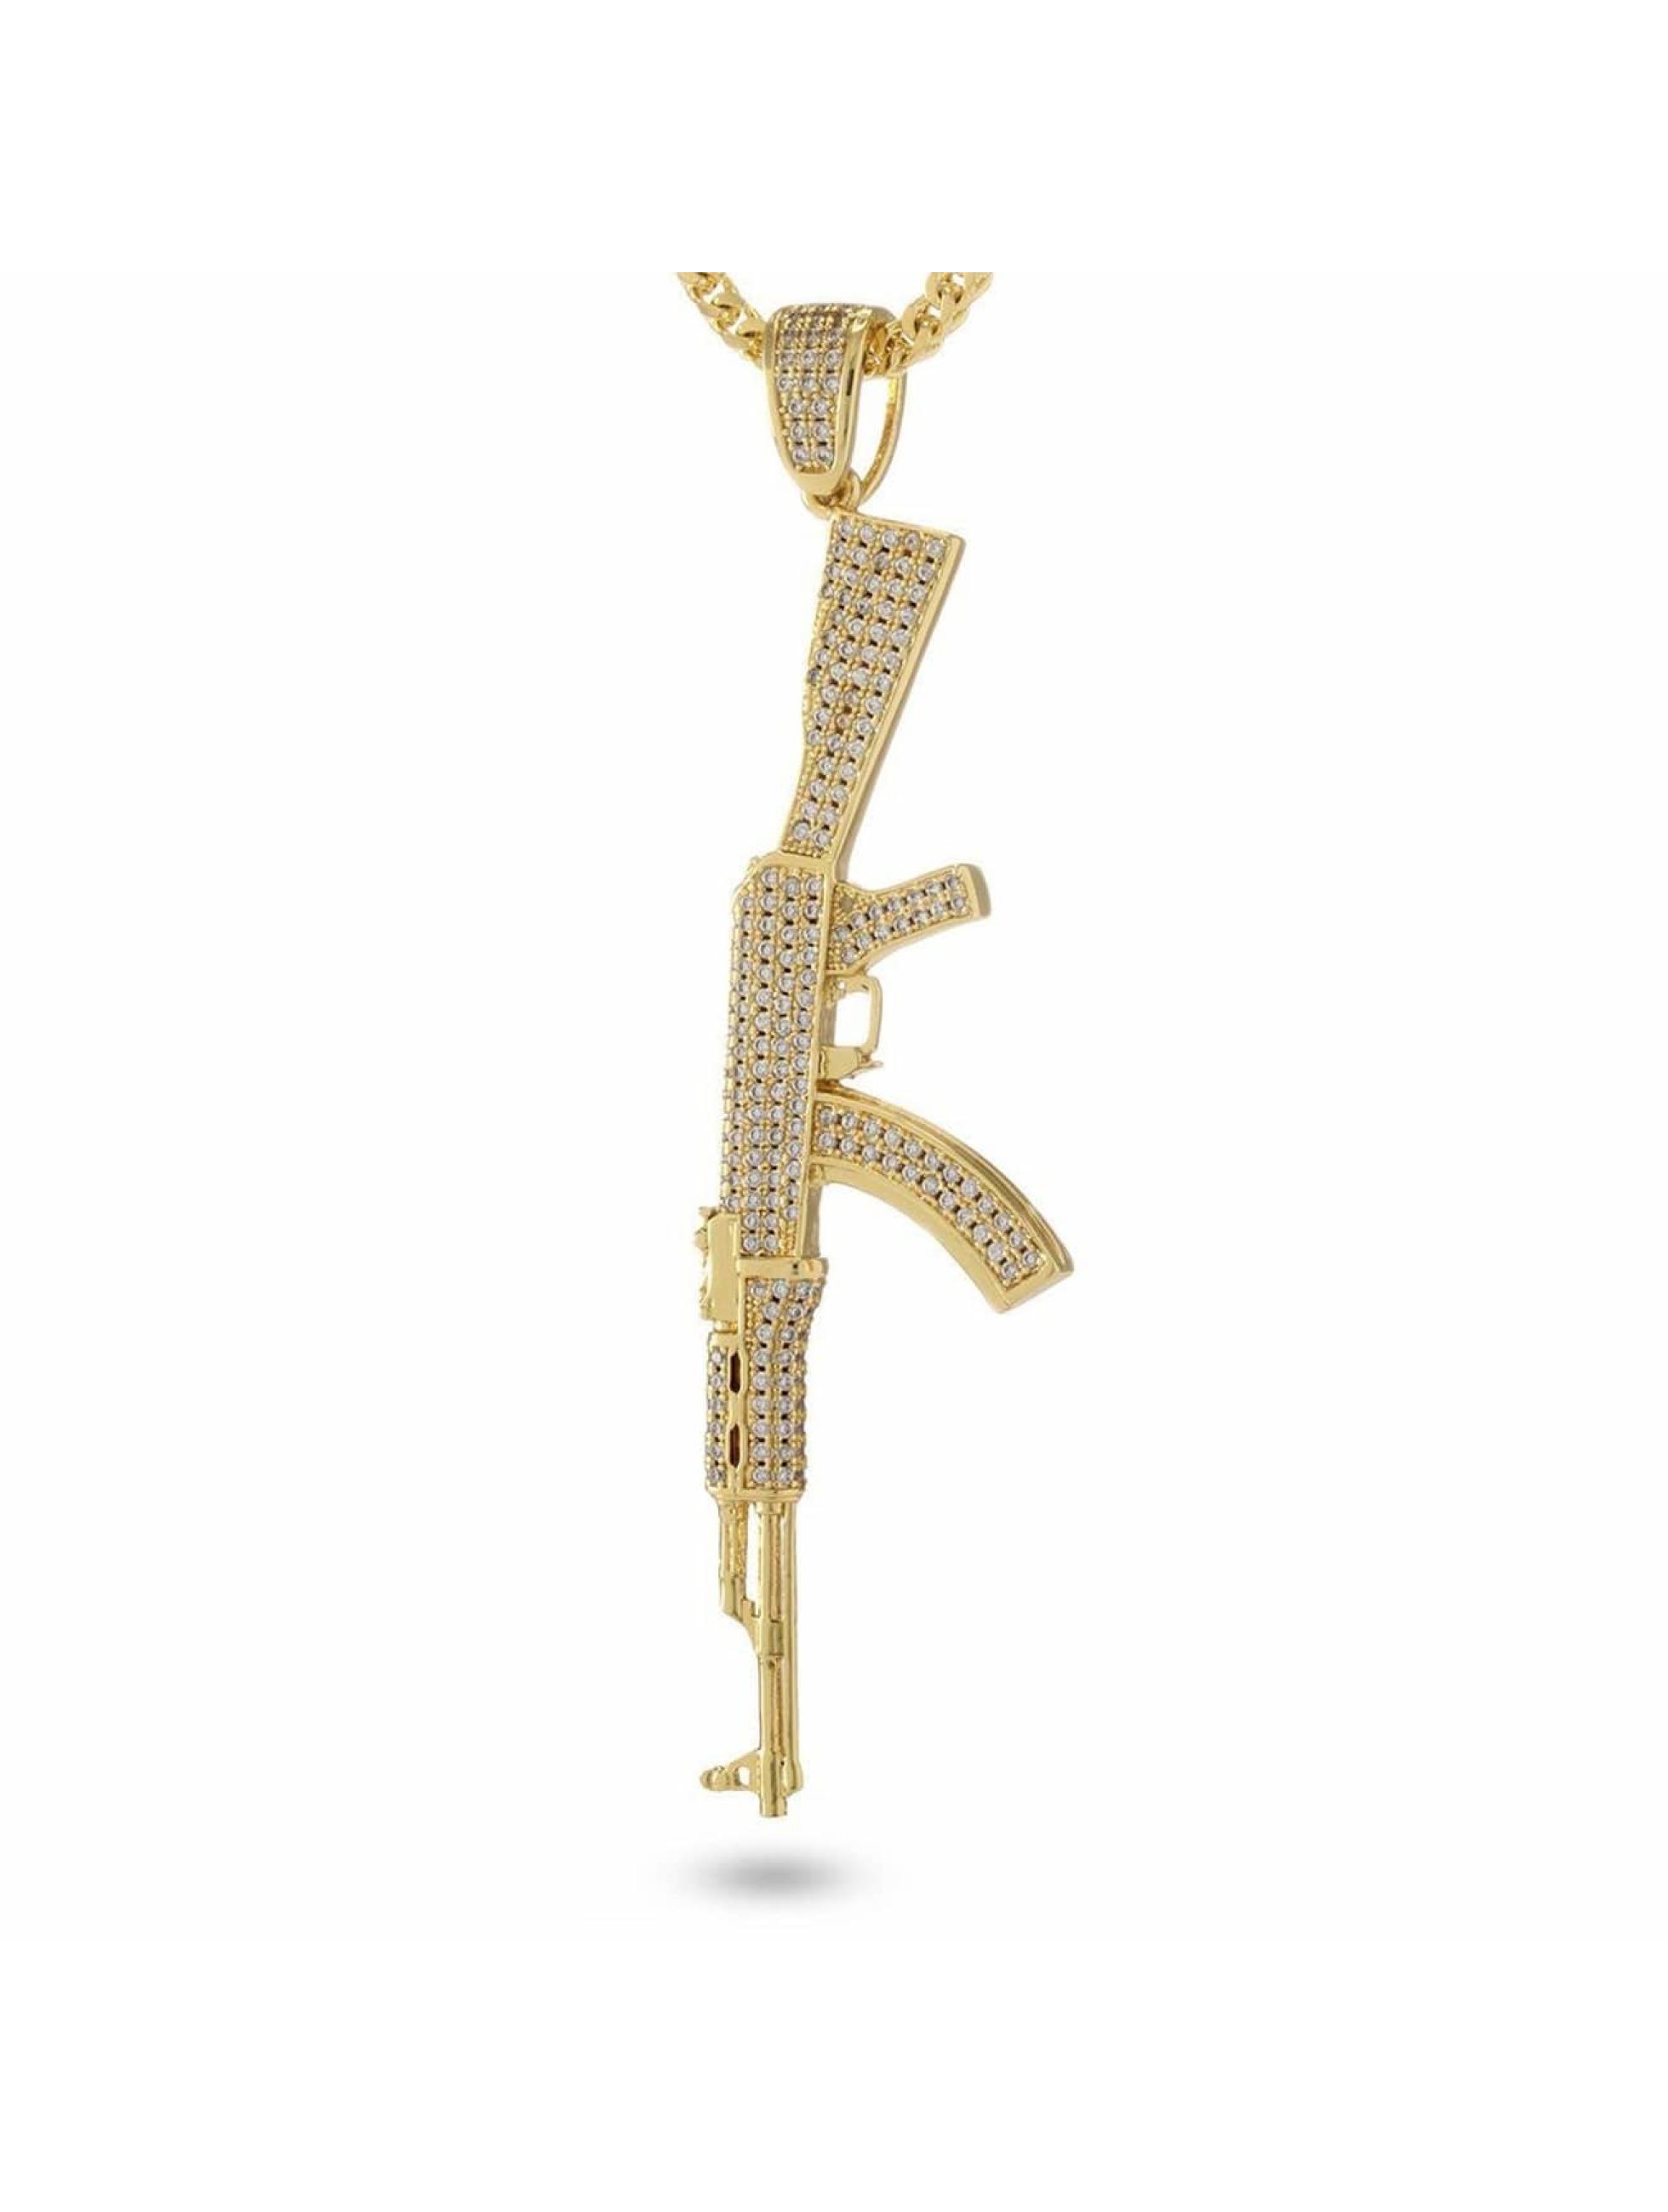 KING ICE Цепочка Studded AK-47 золото